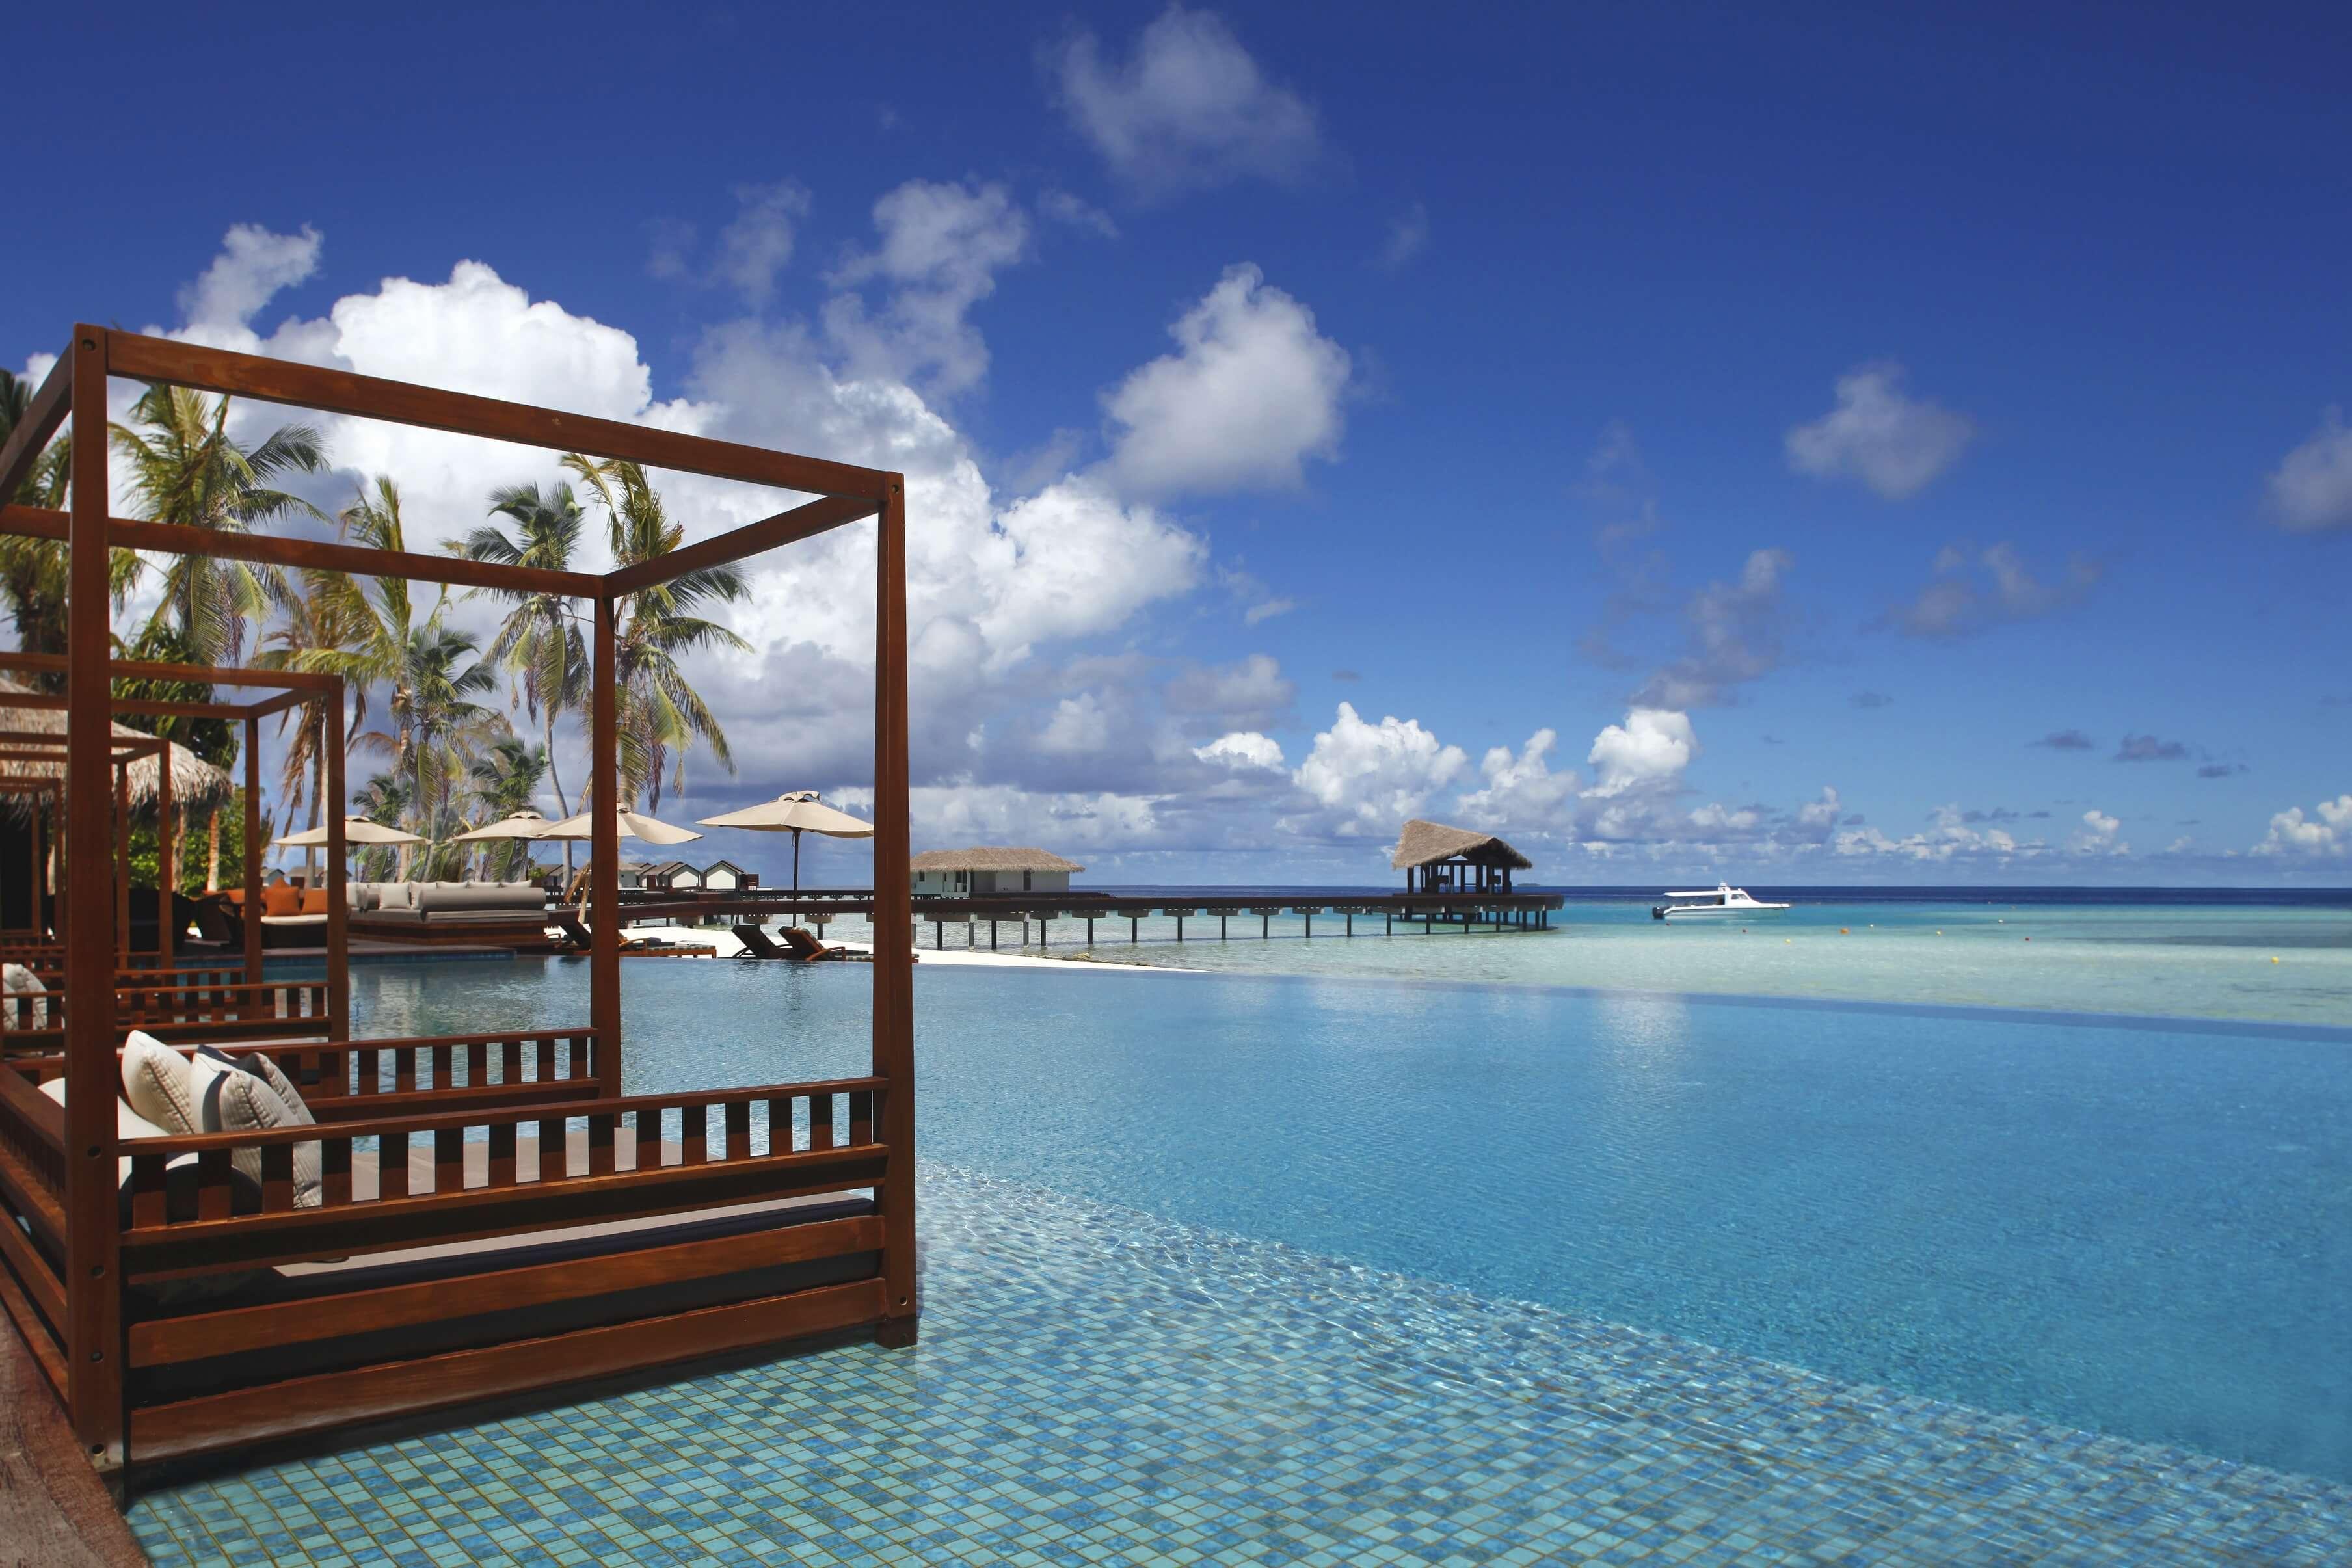 Maldivas - Villas The Residence Maldives by Cenizaro